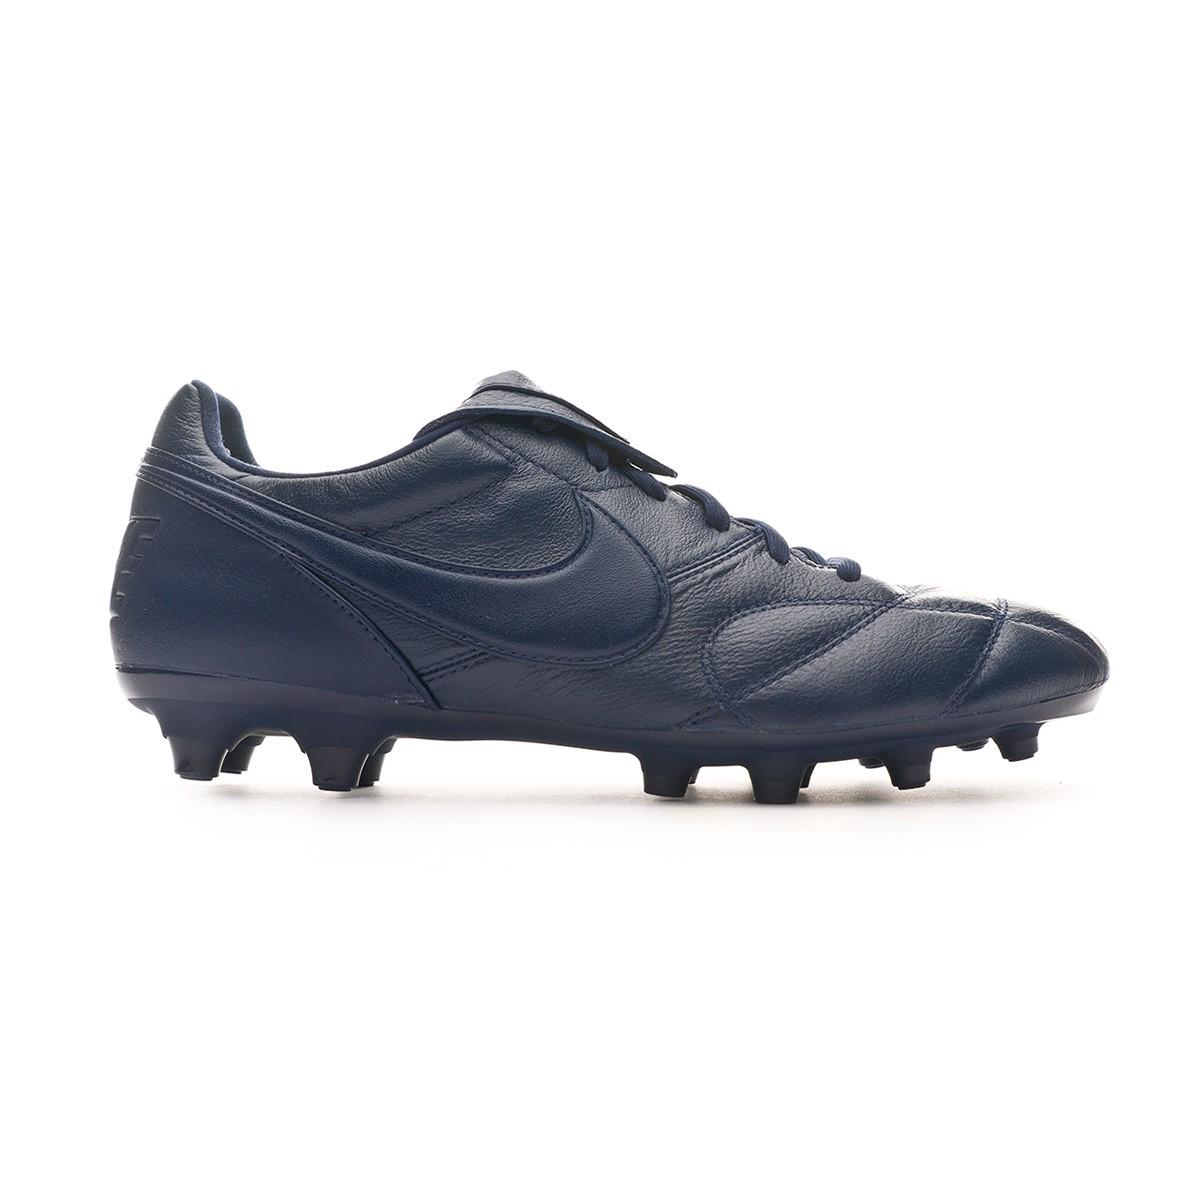 Football Boots Nike Tiempo Premier Ii Fg Midnight Navy